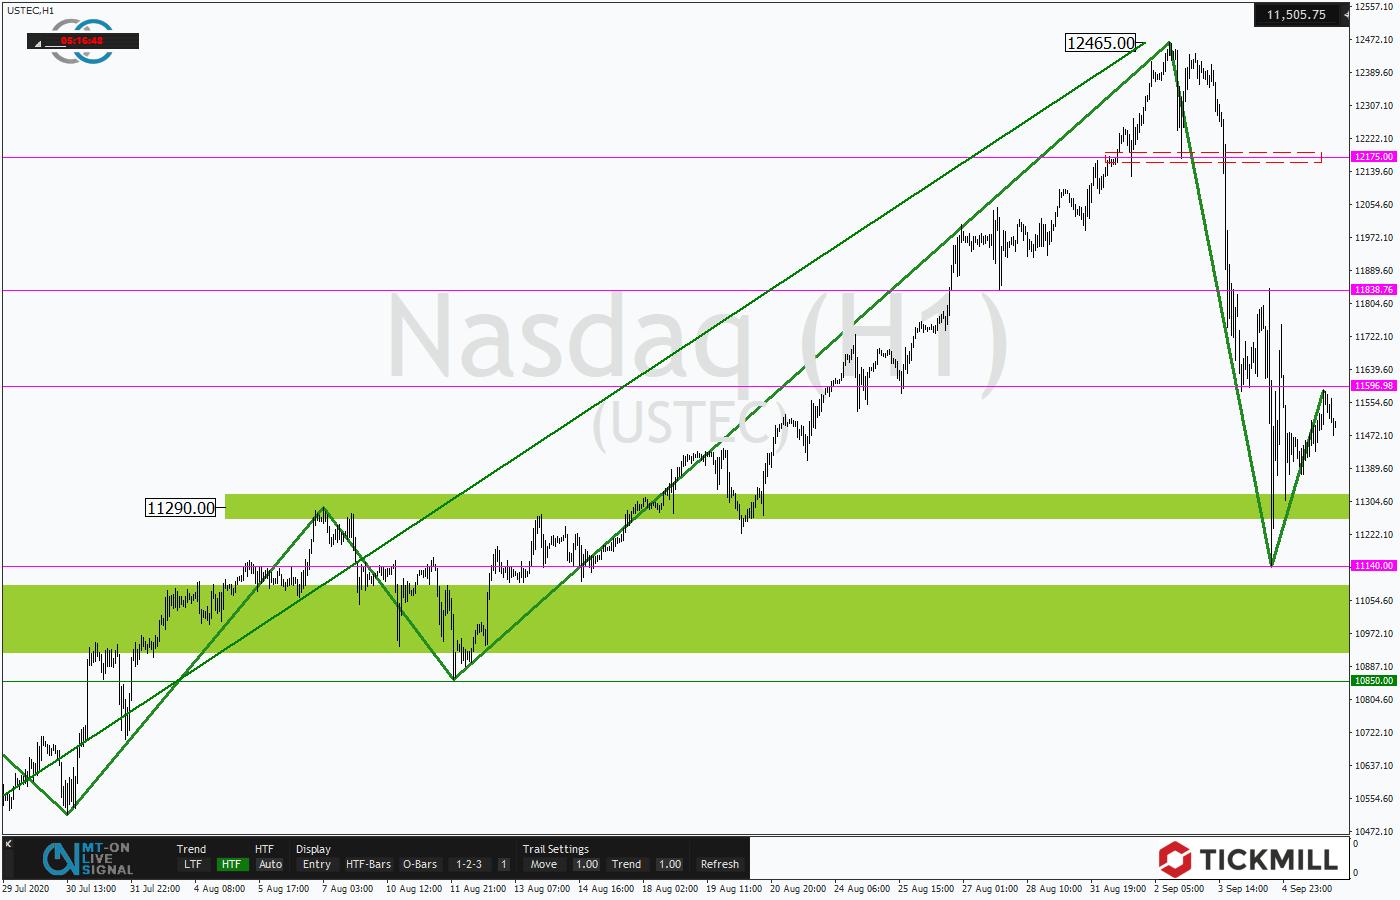 Tickmill-Analyse: Korrekturverlauf im Stundenchart des NASDAQ100